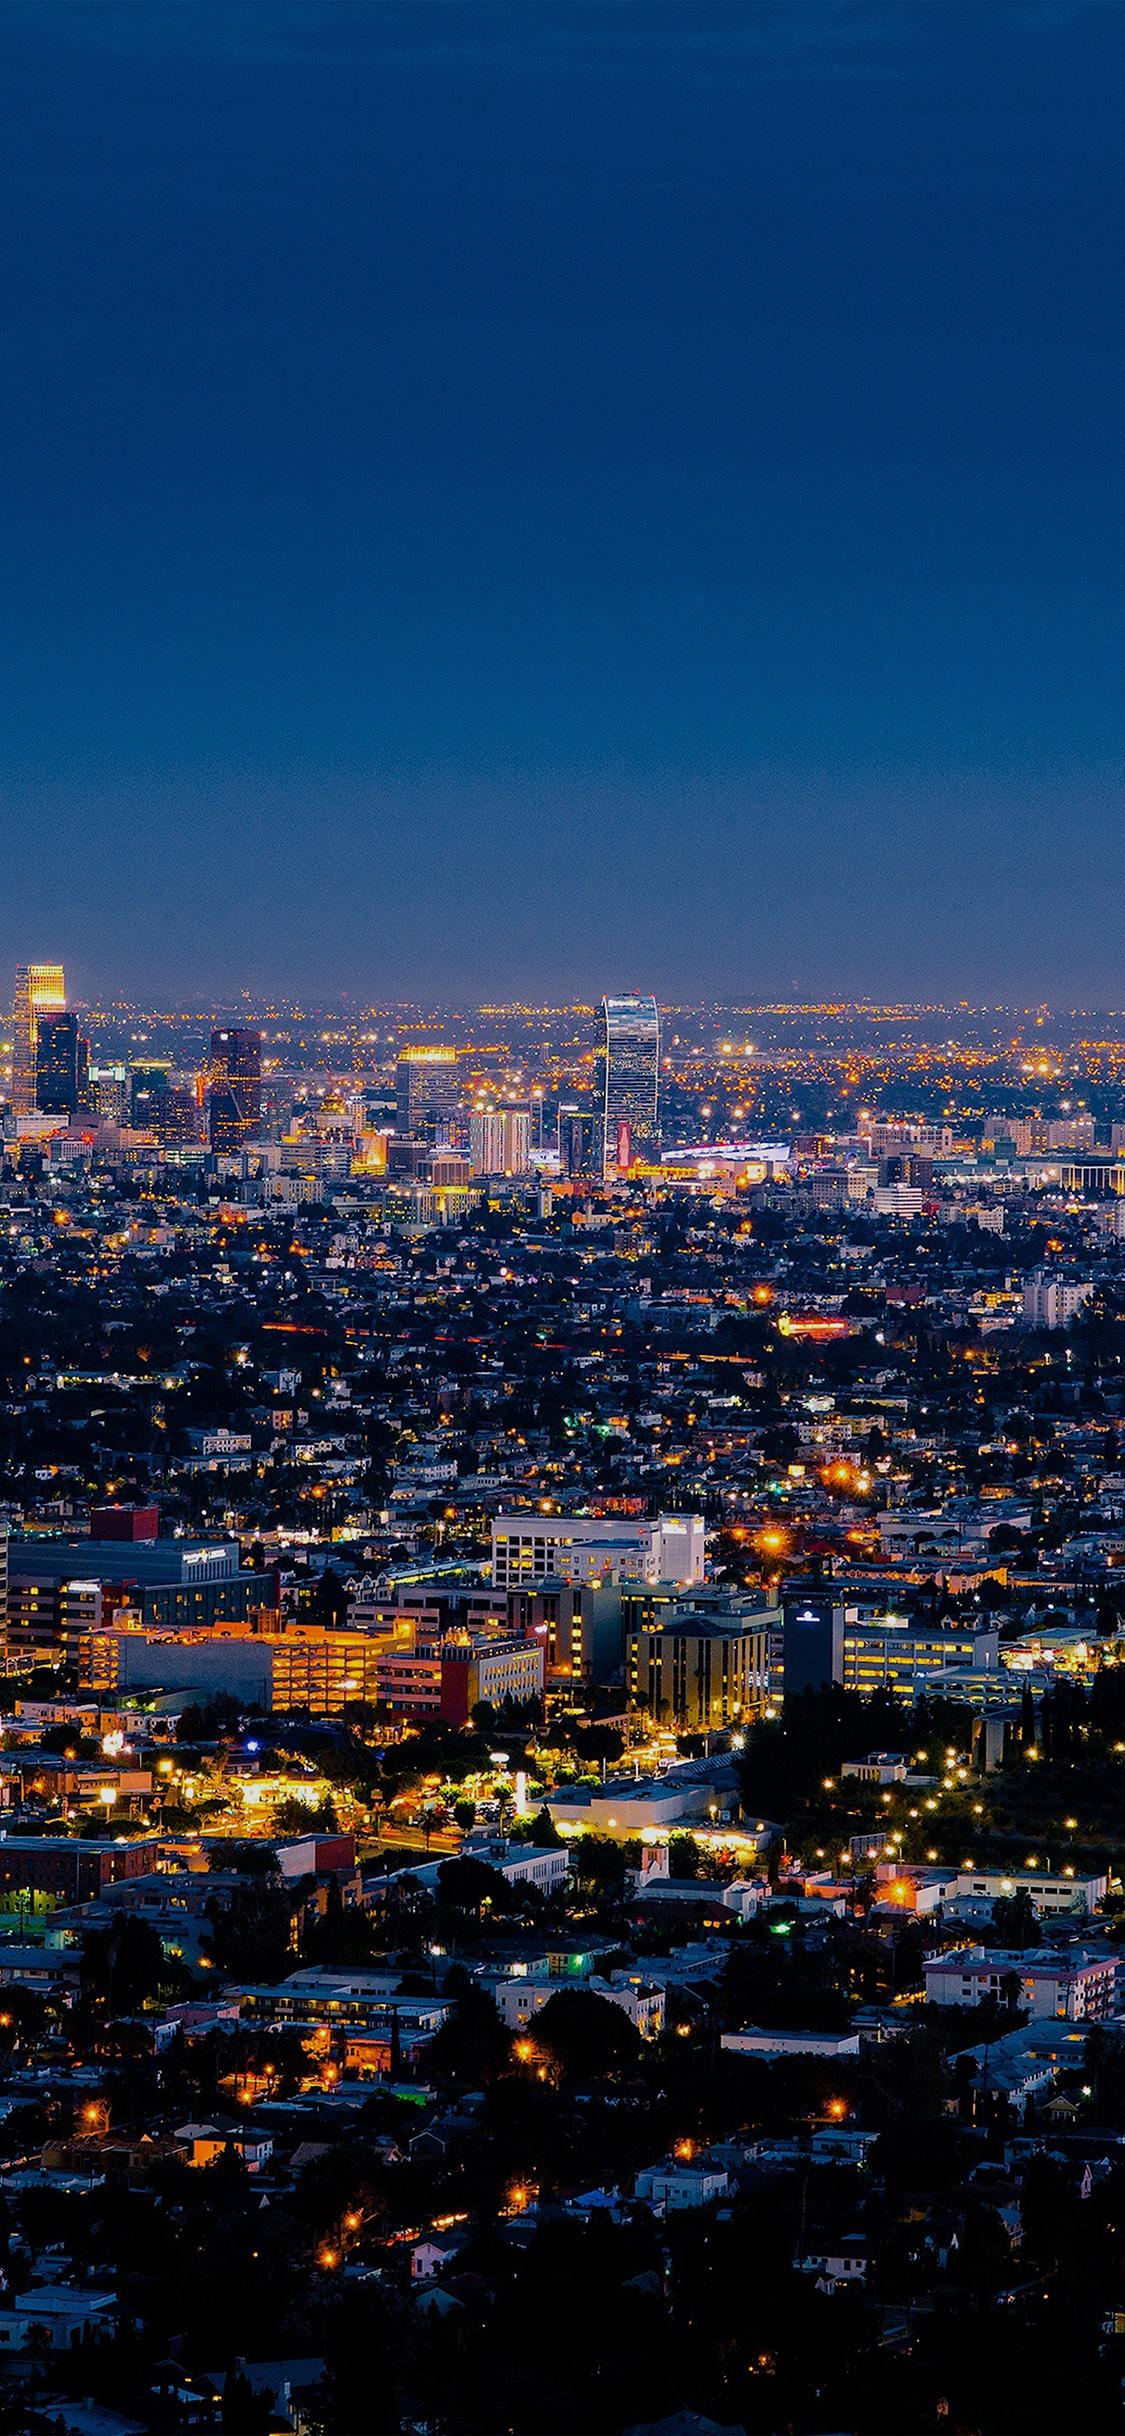 City Lights San Francisco k Wallpaper HD Wallpapers